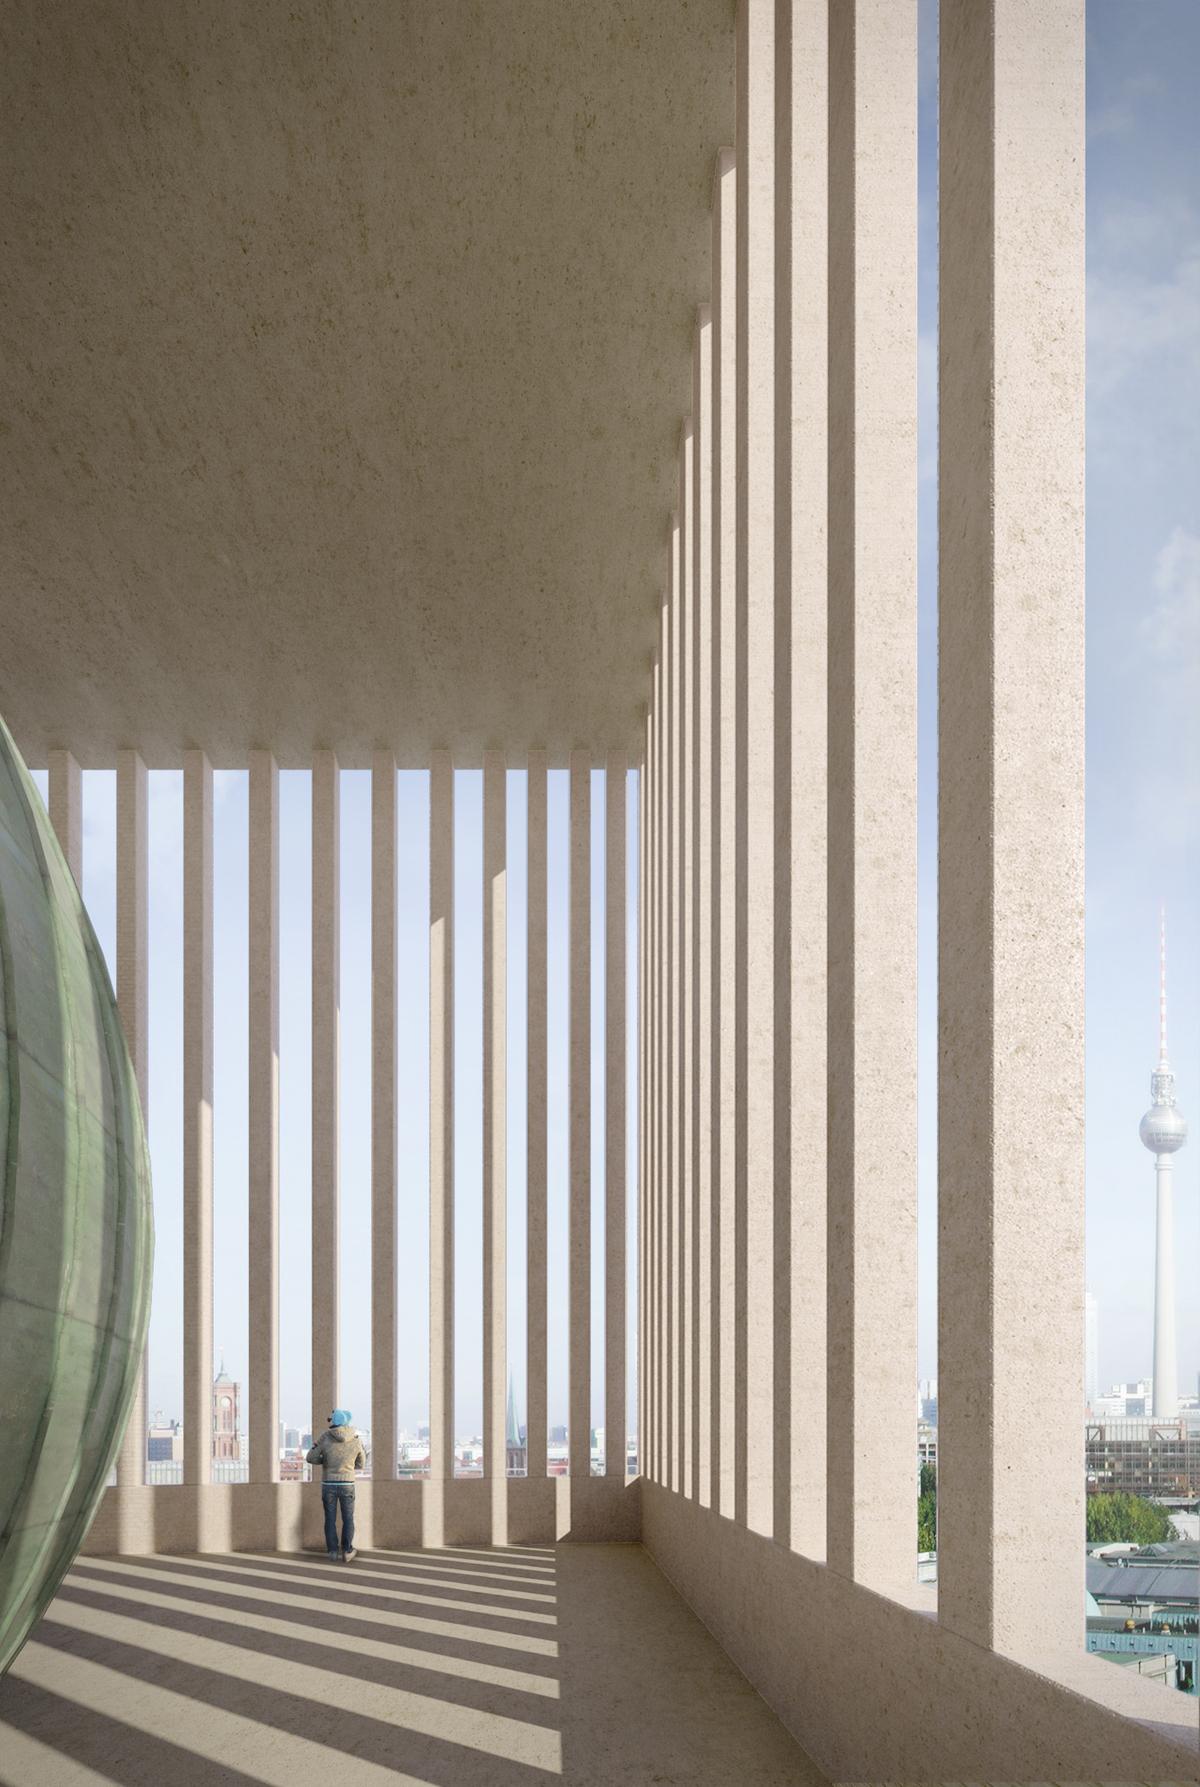 City Loggia © Kuehn Malvezzi, Visualization: Kuehn Malvezzi